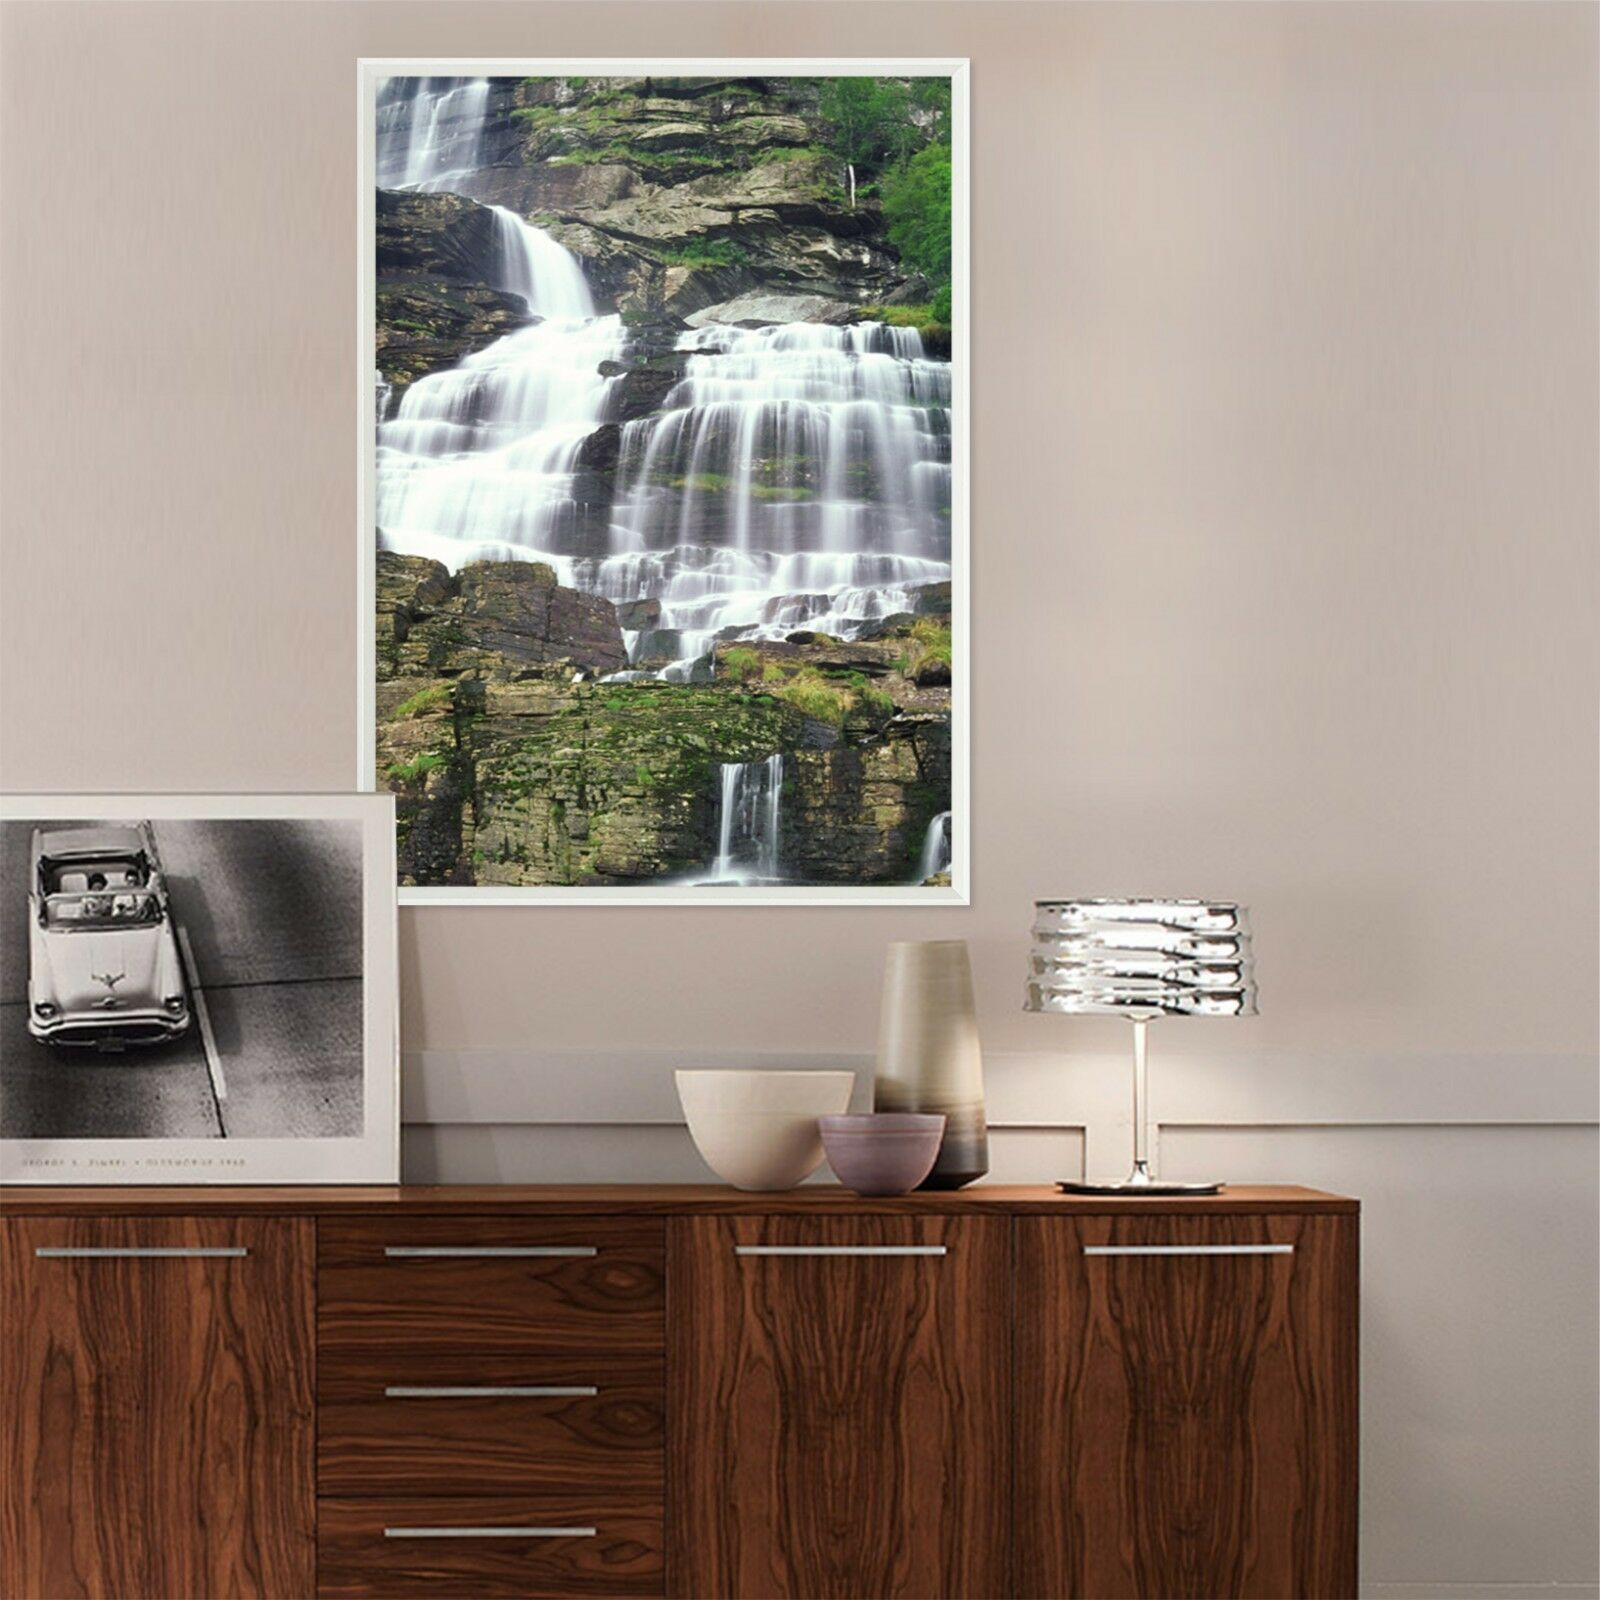 3D Weiß Waterfall  3 Framed Poster Home Decor Print Painting Art AJ WALLPAPER